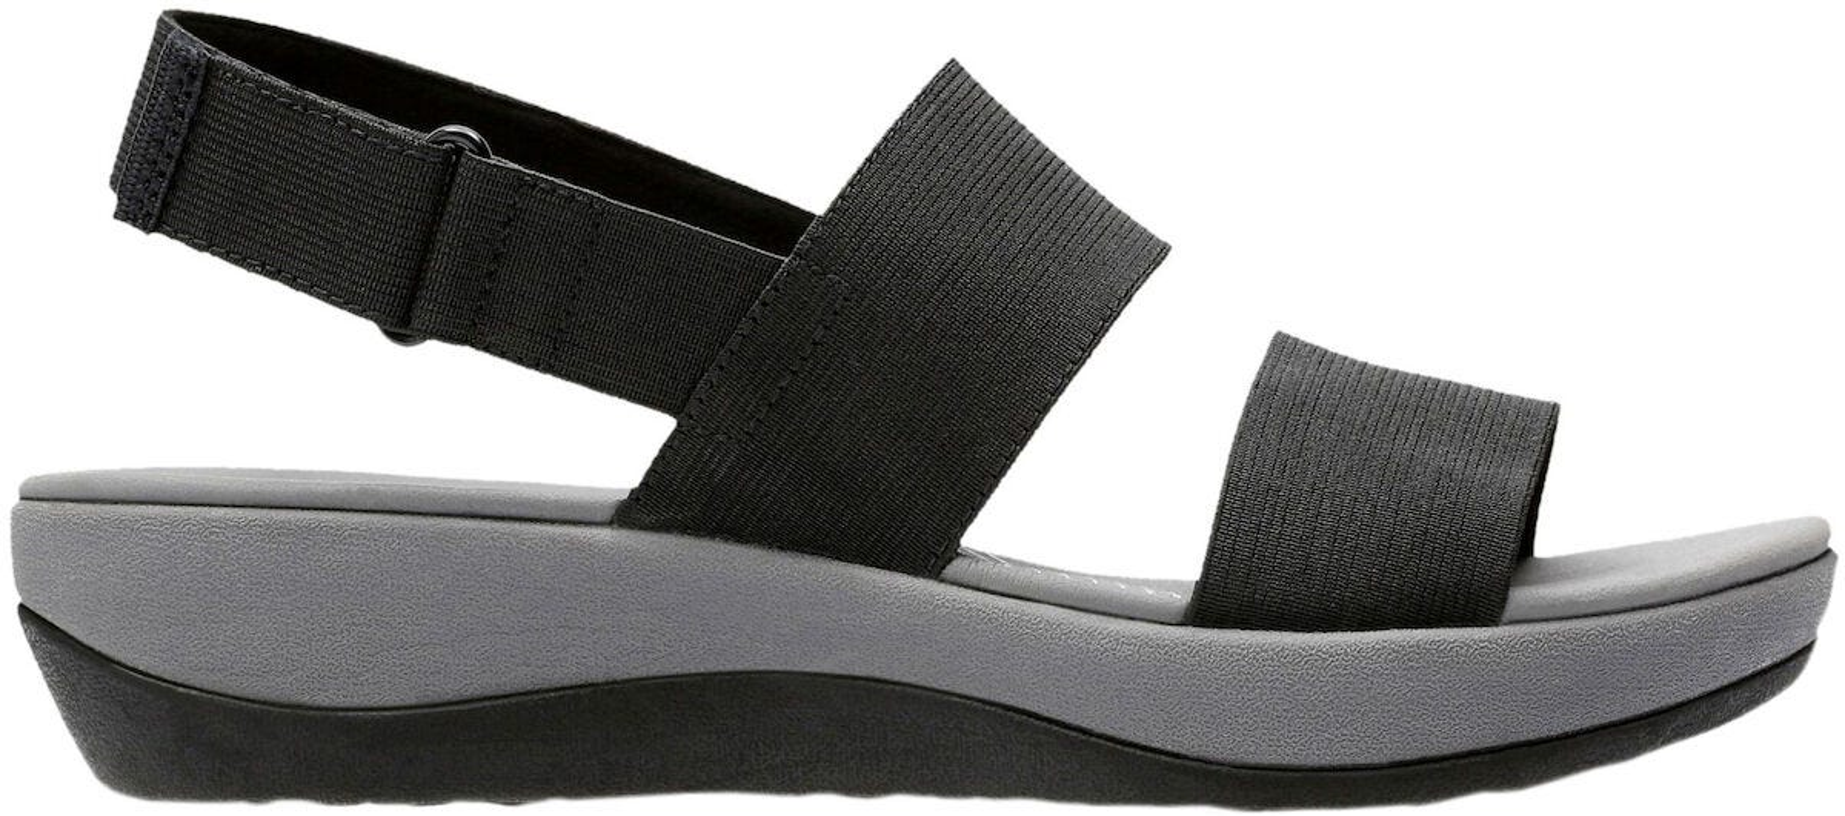 Women Clarks Platform Sandals black Arla Jacory 26125603